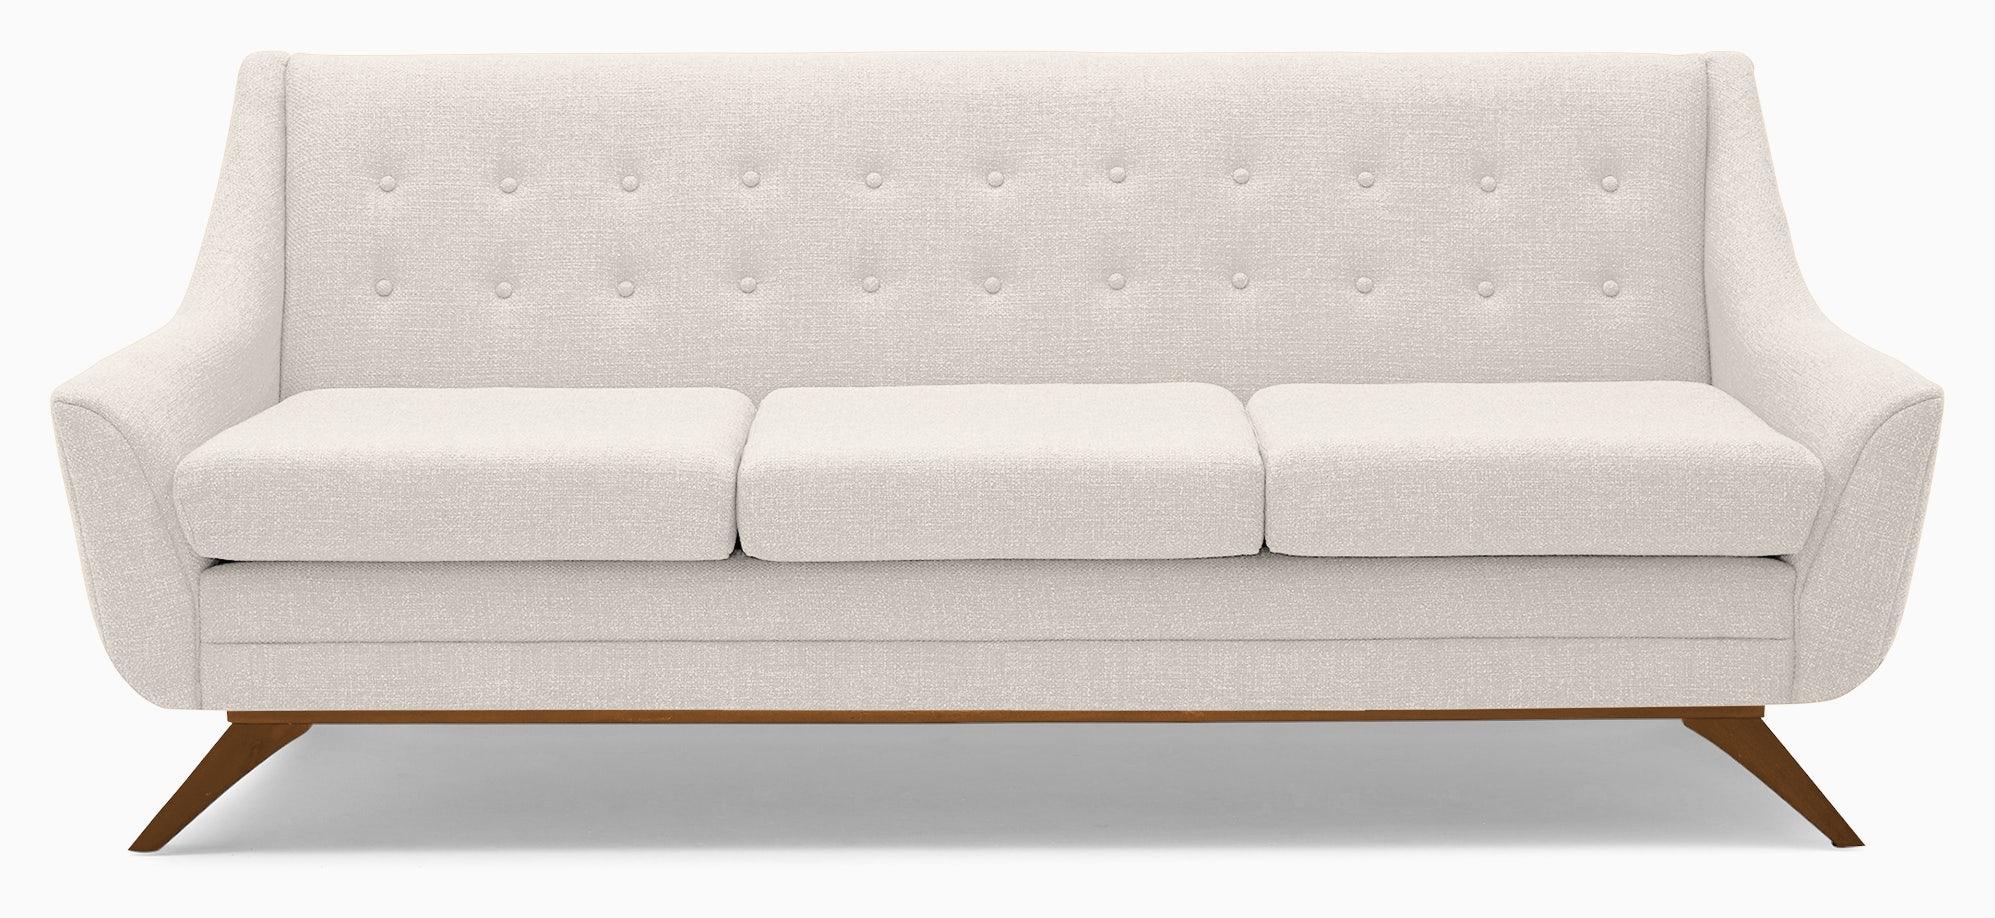 aubrey sofa lucky divine